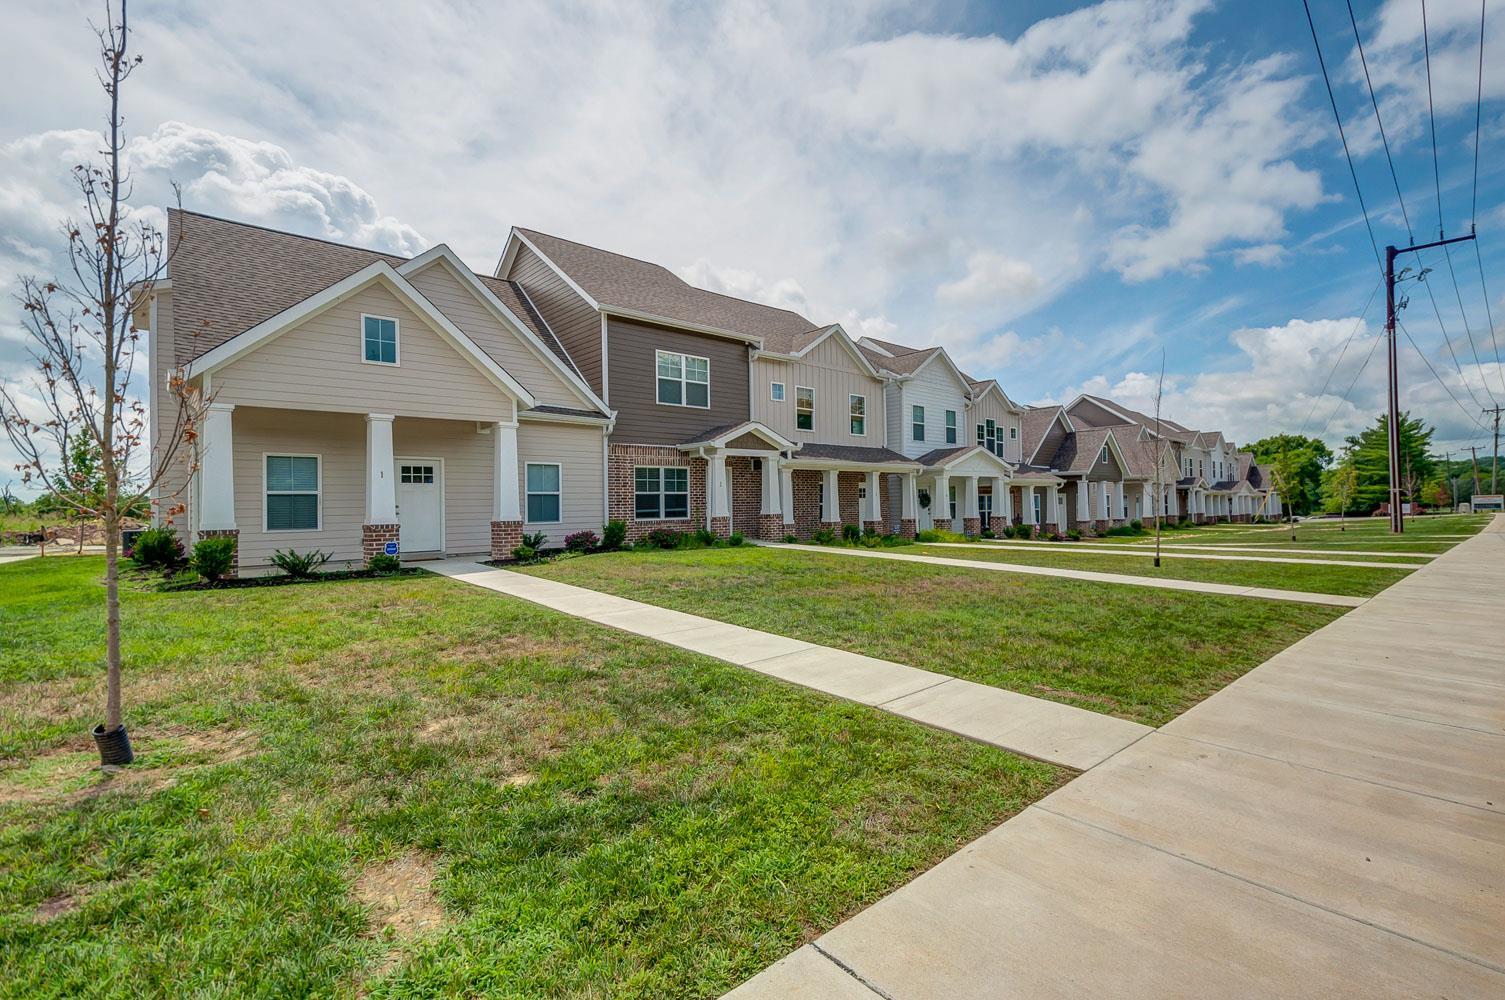 832 Ashland Place Dr, Nashville, TN 37218 - Nashville, TN real estate listing